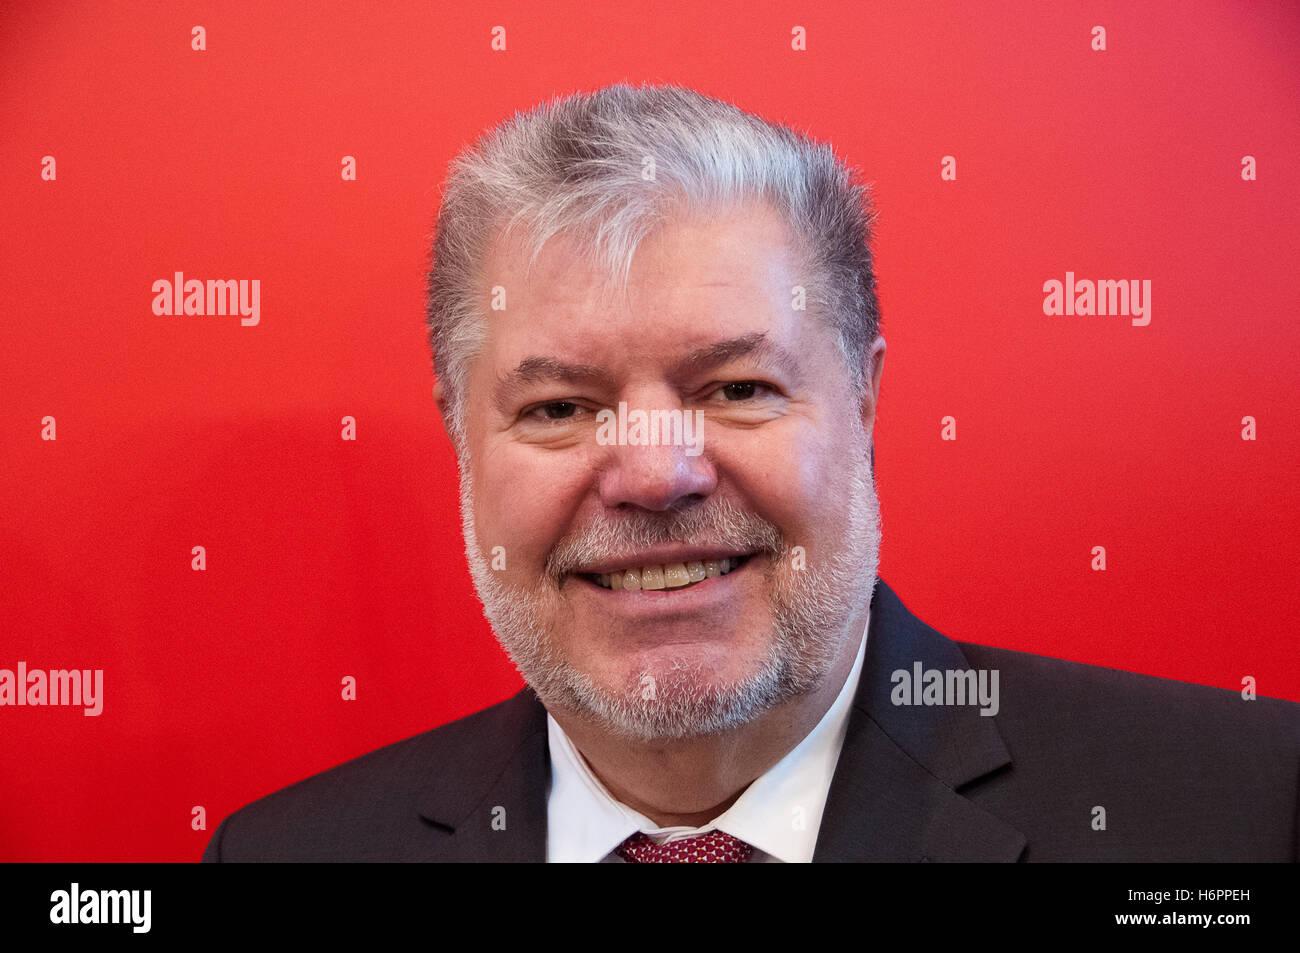 Kurt Beck, deutscher Politiker (SPD, Frankfurter Buchmesse 2014 Stockbild